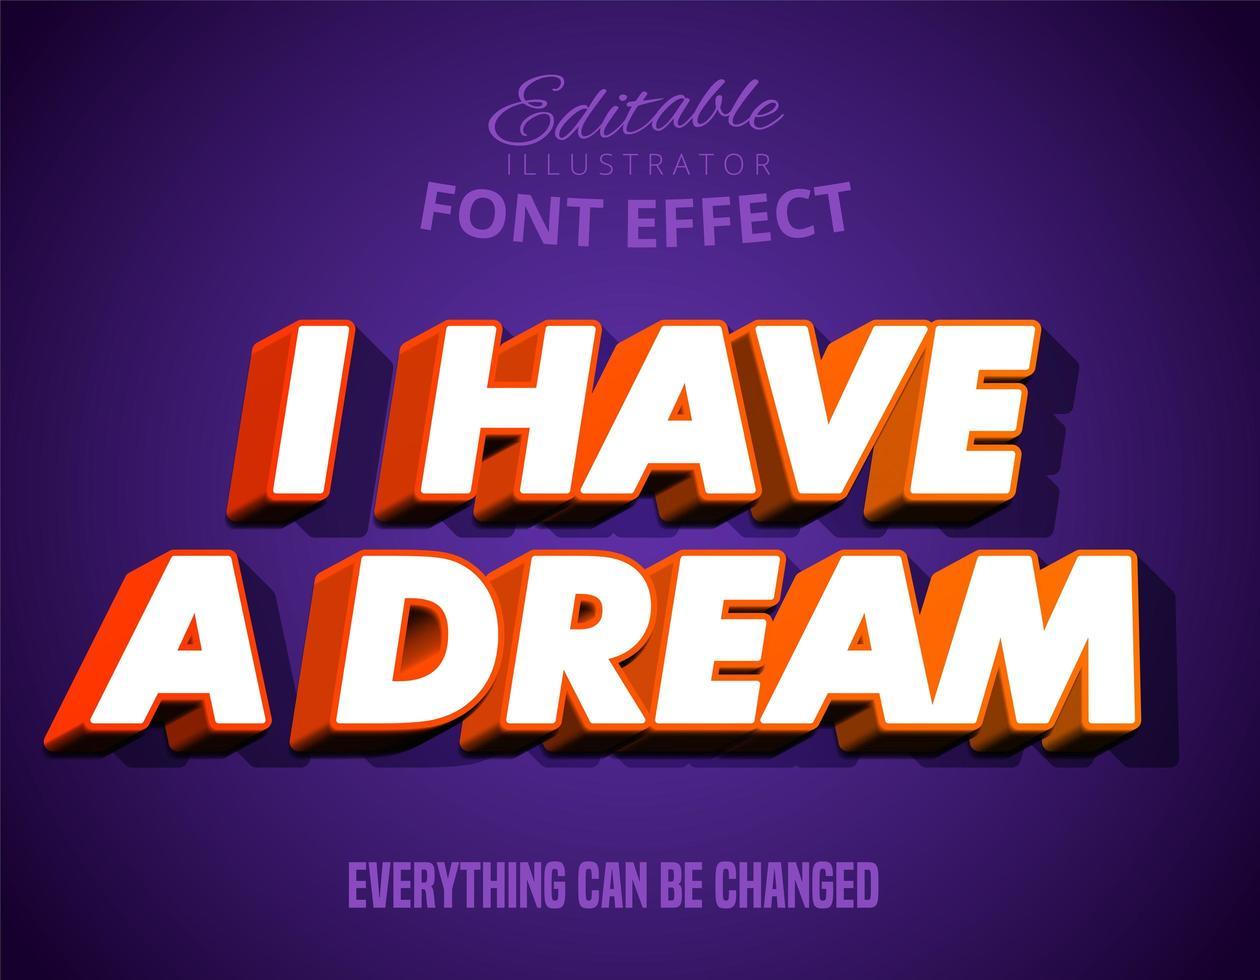 Ik heb een Dream Modern sterk vetgedrukt teksteffect vector